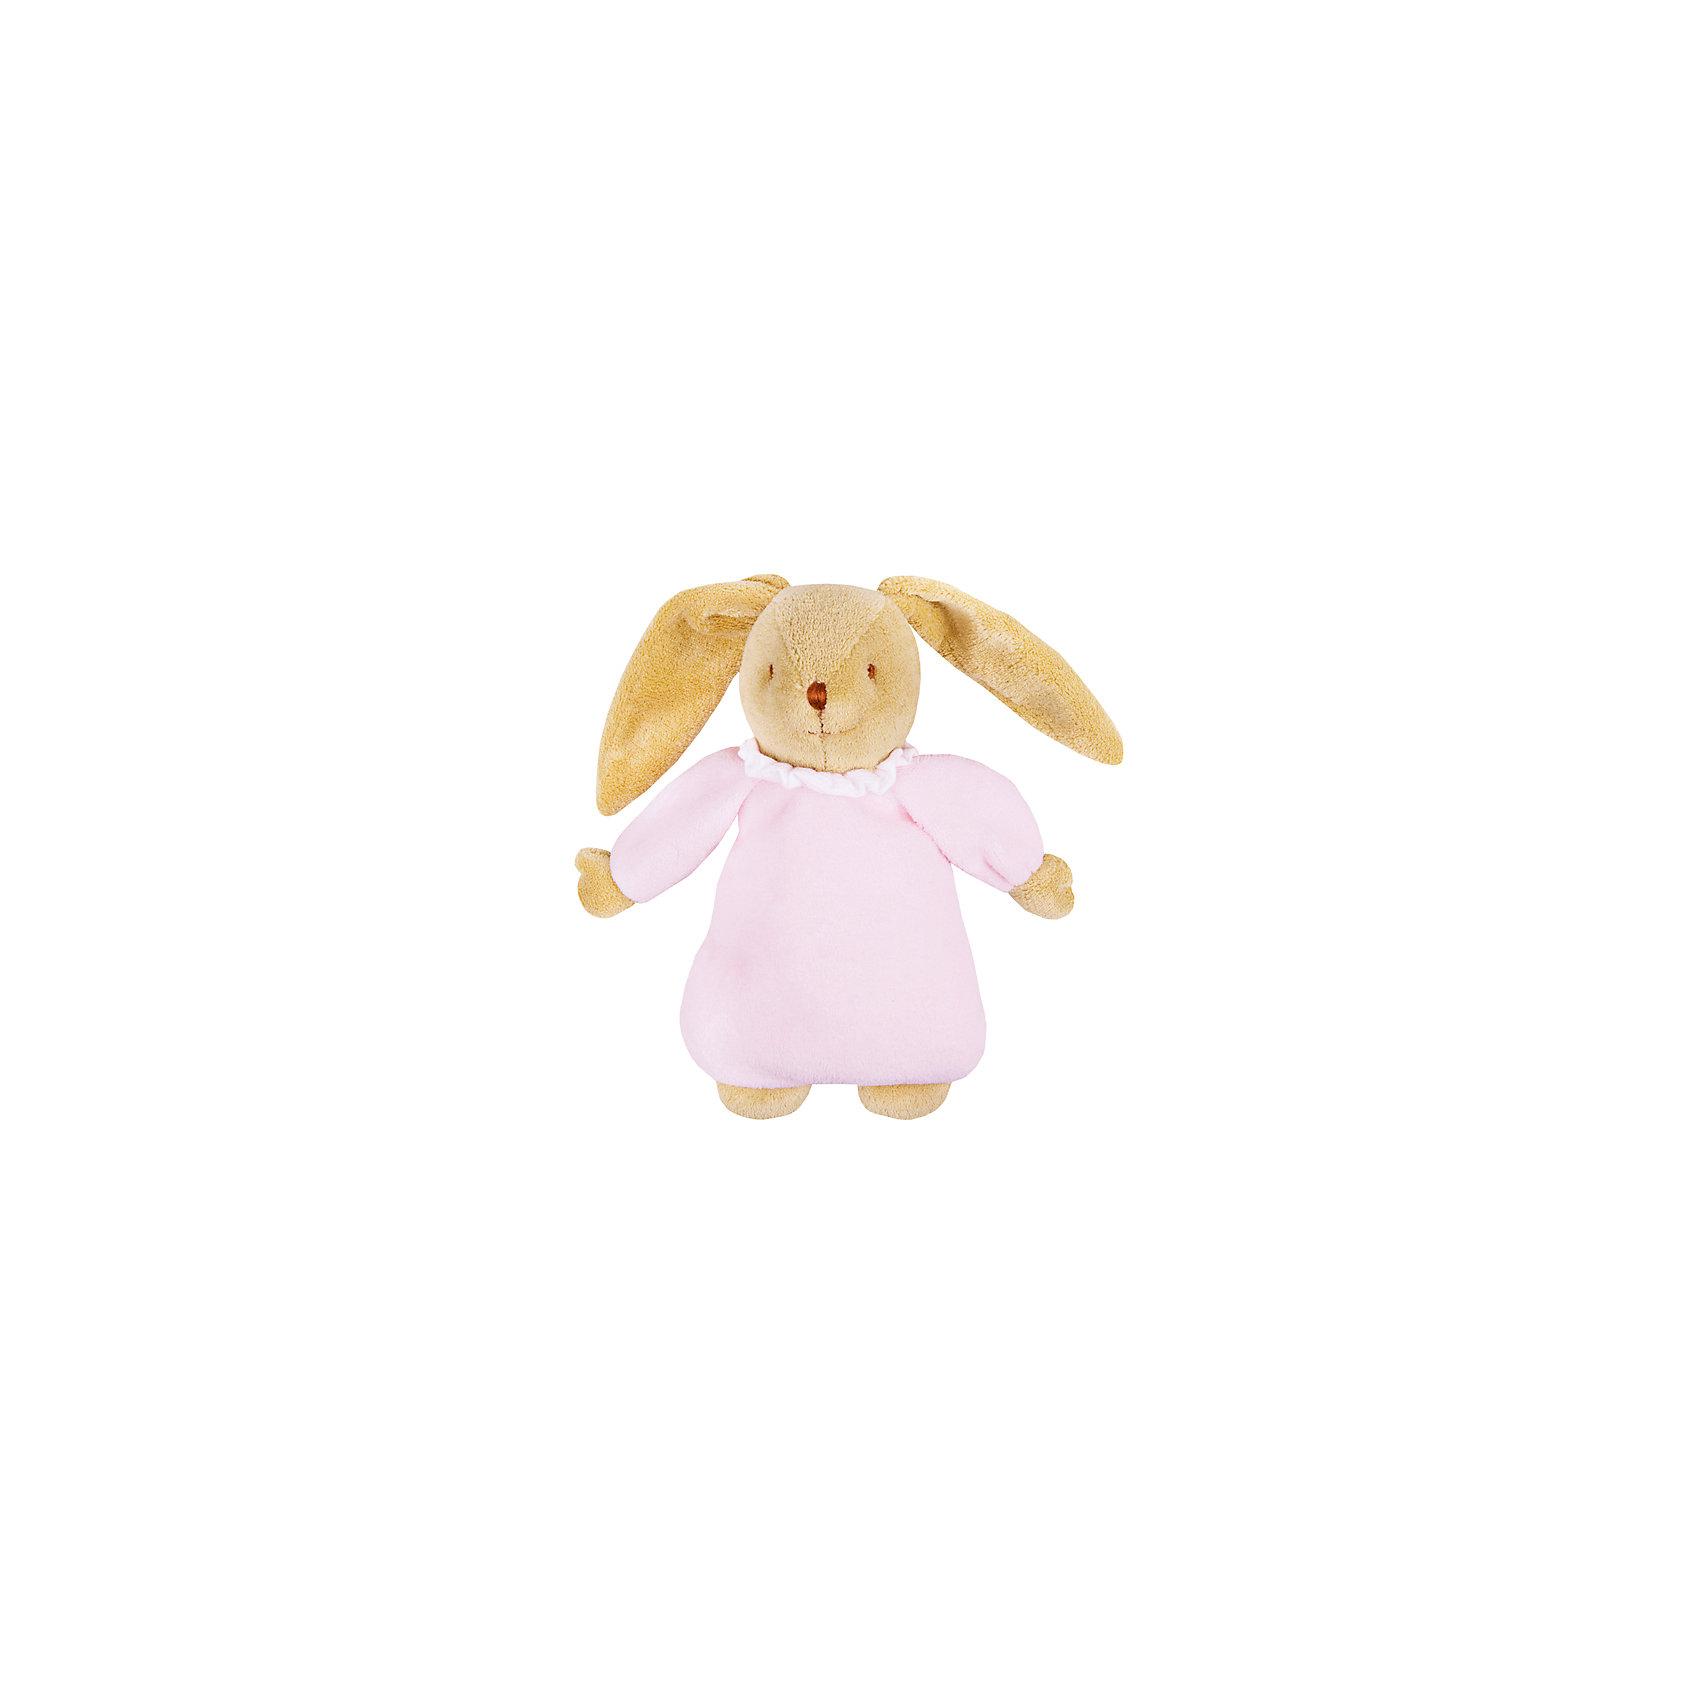 TROUSSELIER Мягкая игрушка Зайка с музыкой, розовый, 25см, Trousselier trousselier мягкая игрушка зайка с музыкой розовый 25см trousselier